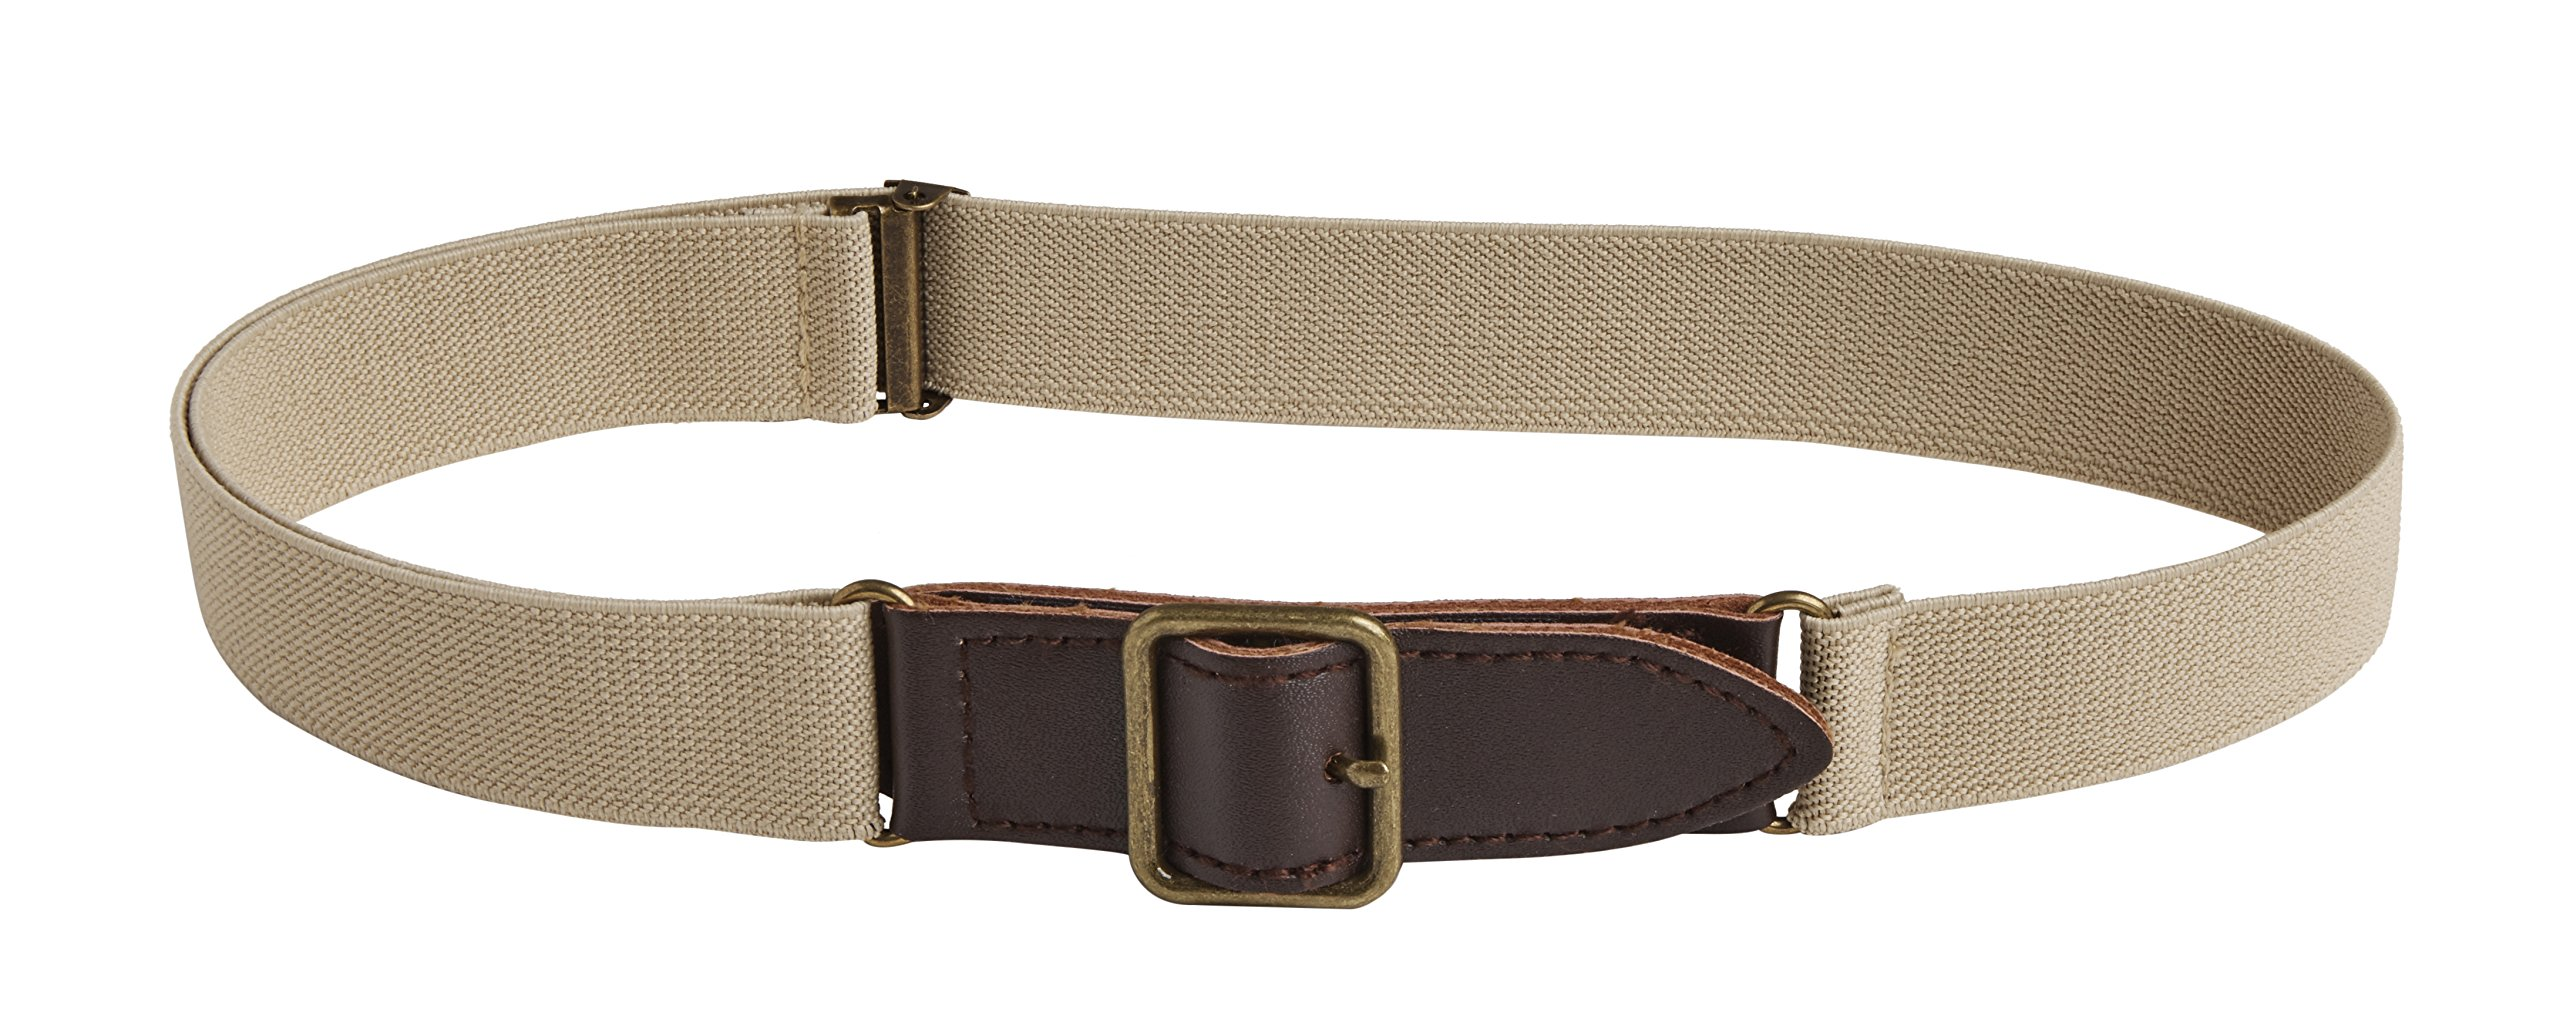 Sportoli Kids Elastic Adjustable Leather Front Stretch Belt Hook n Loop Closure - Tan